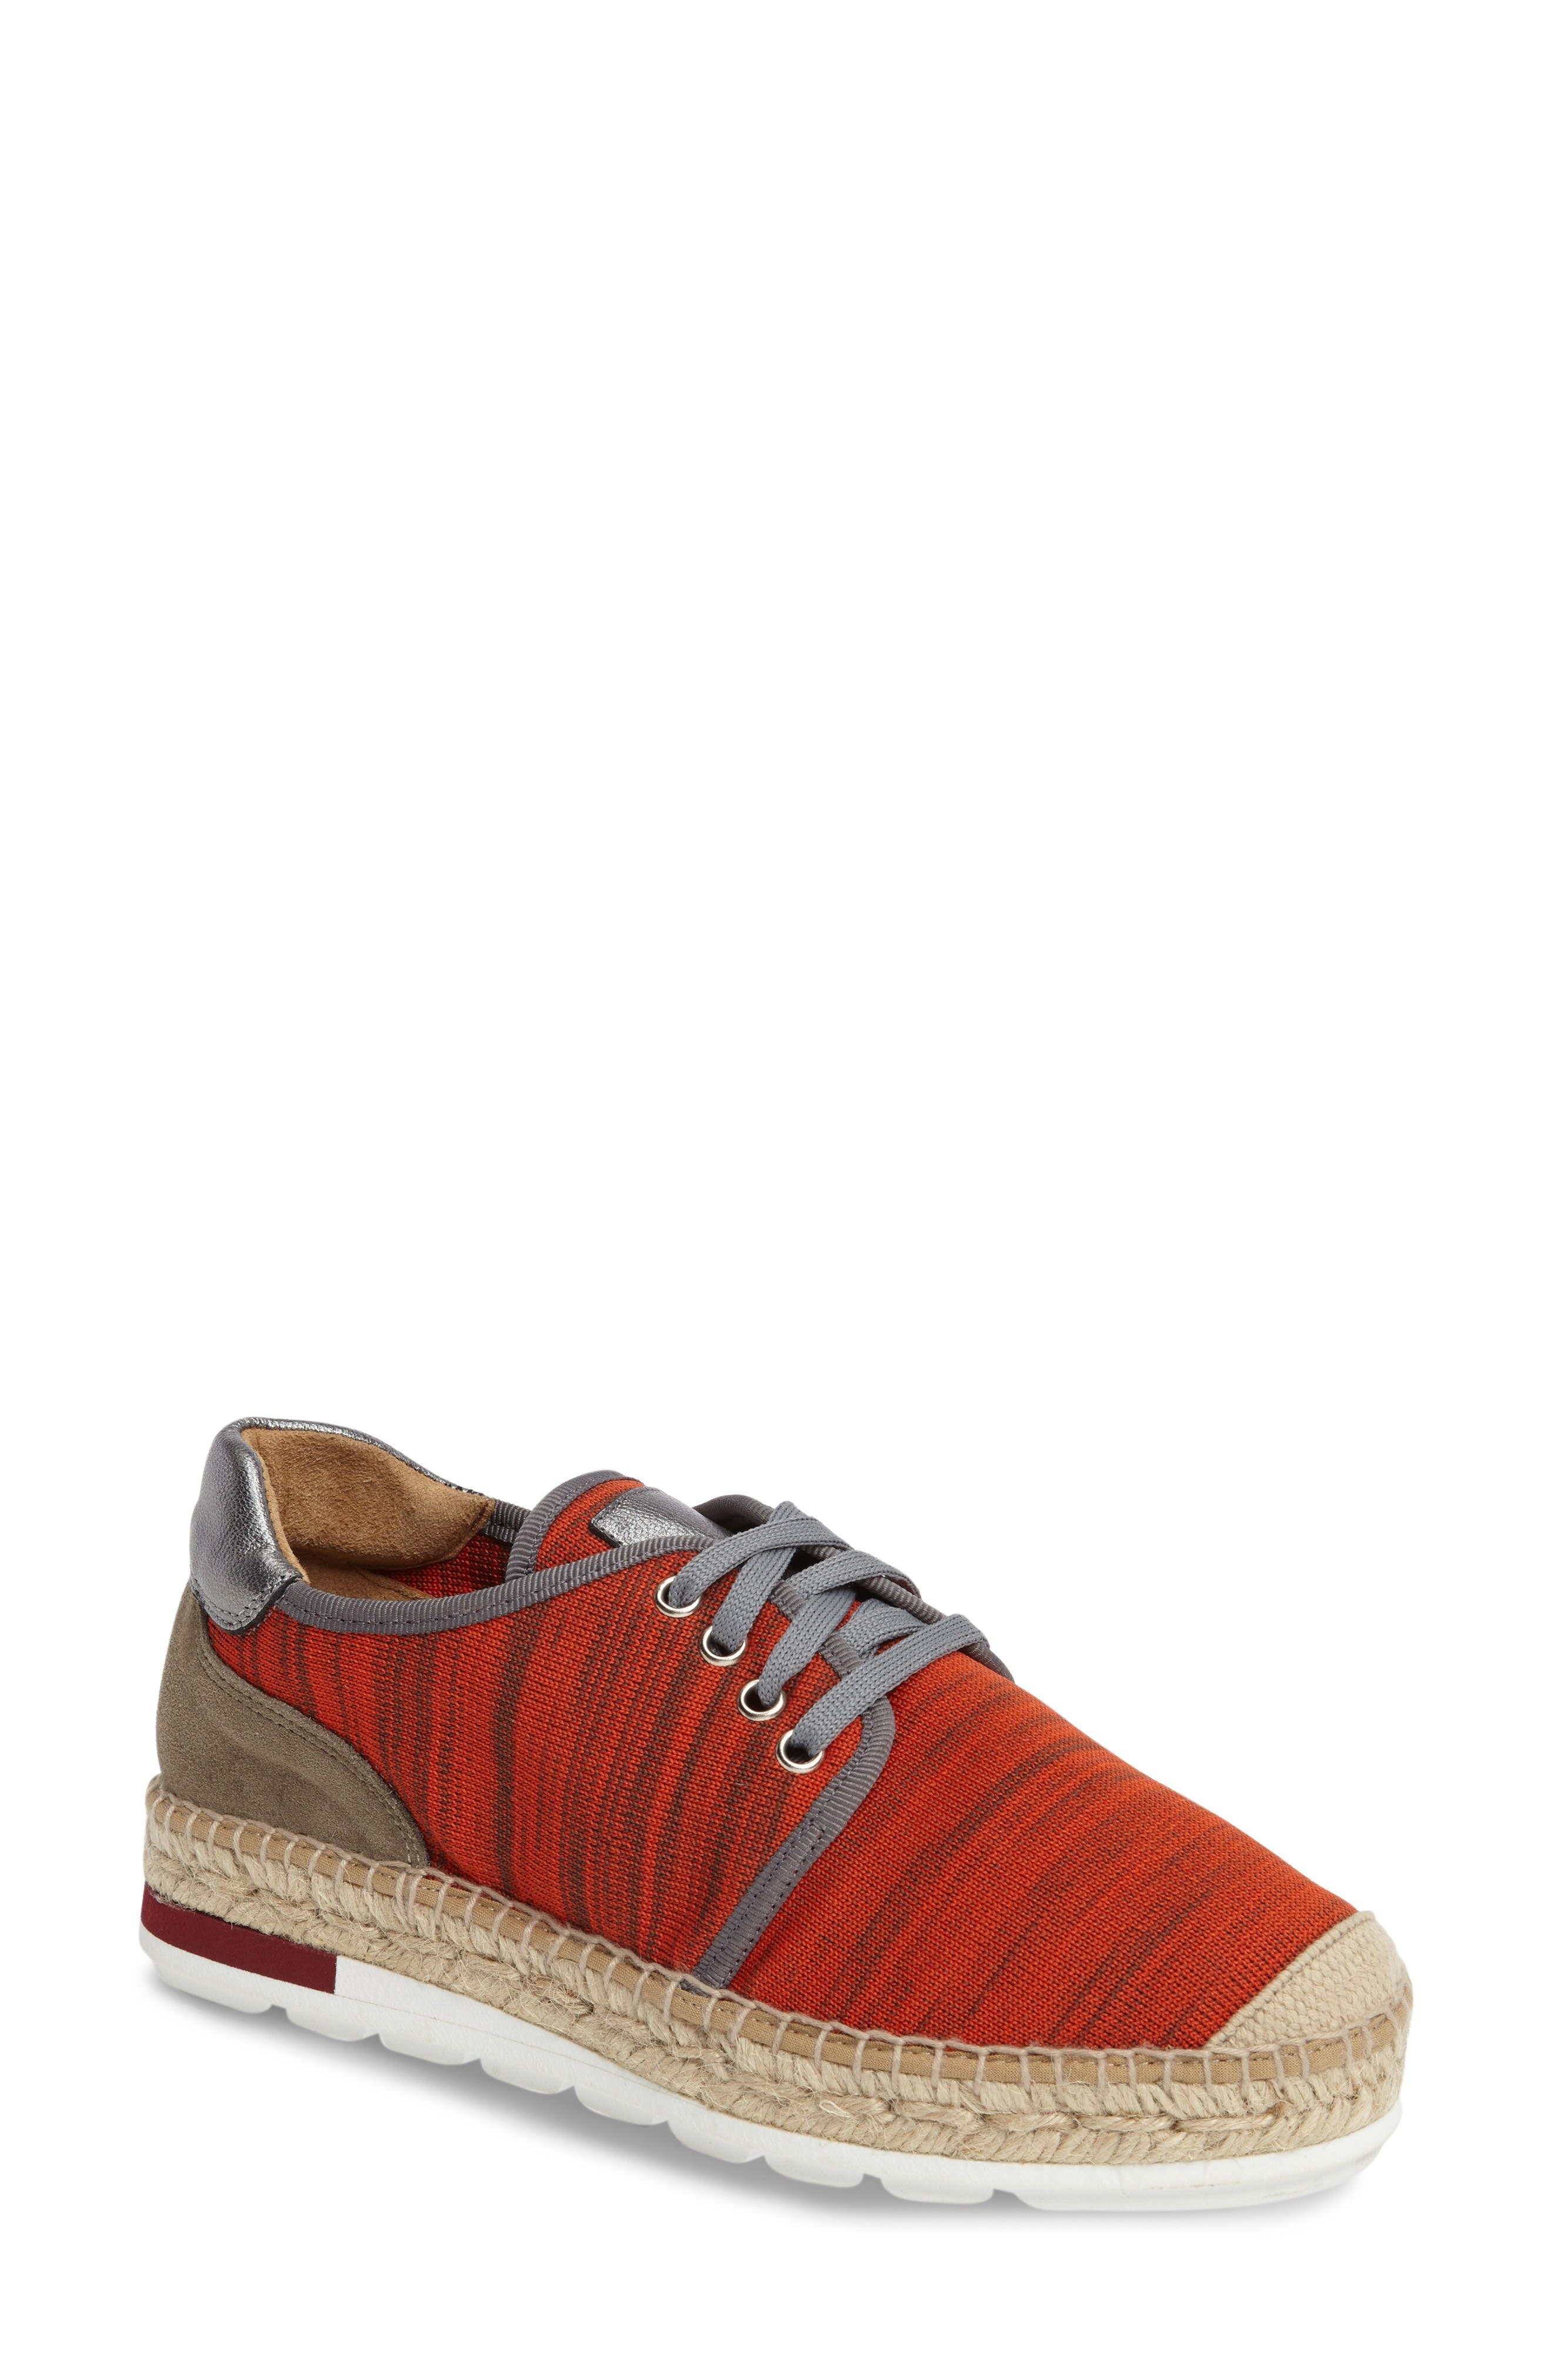 Main Image - Bettye Muller Newport Mesh Espadrille Sneaker (Women)